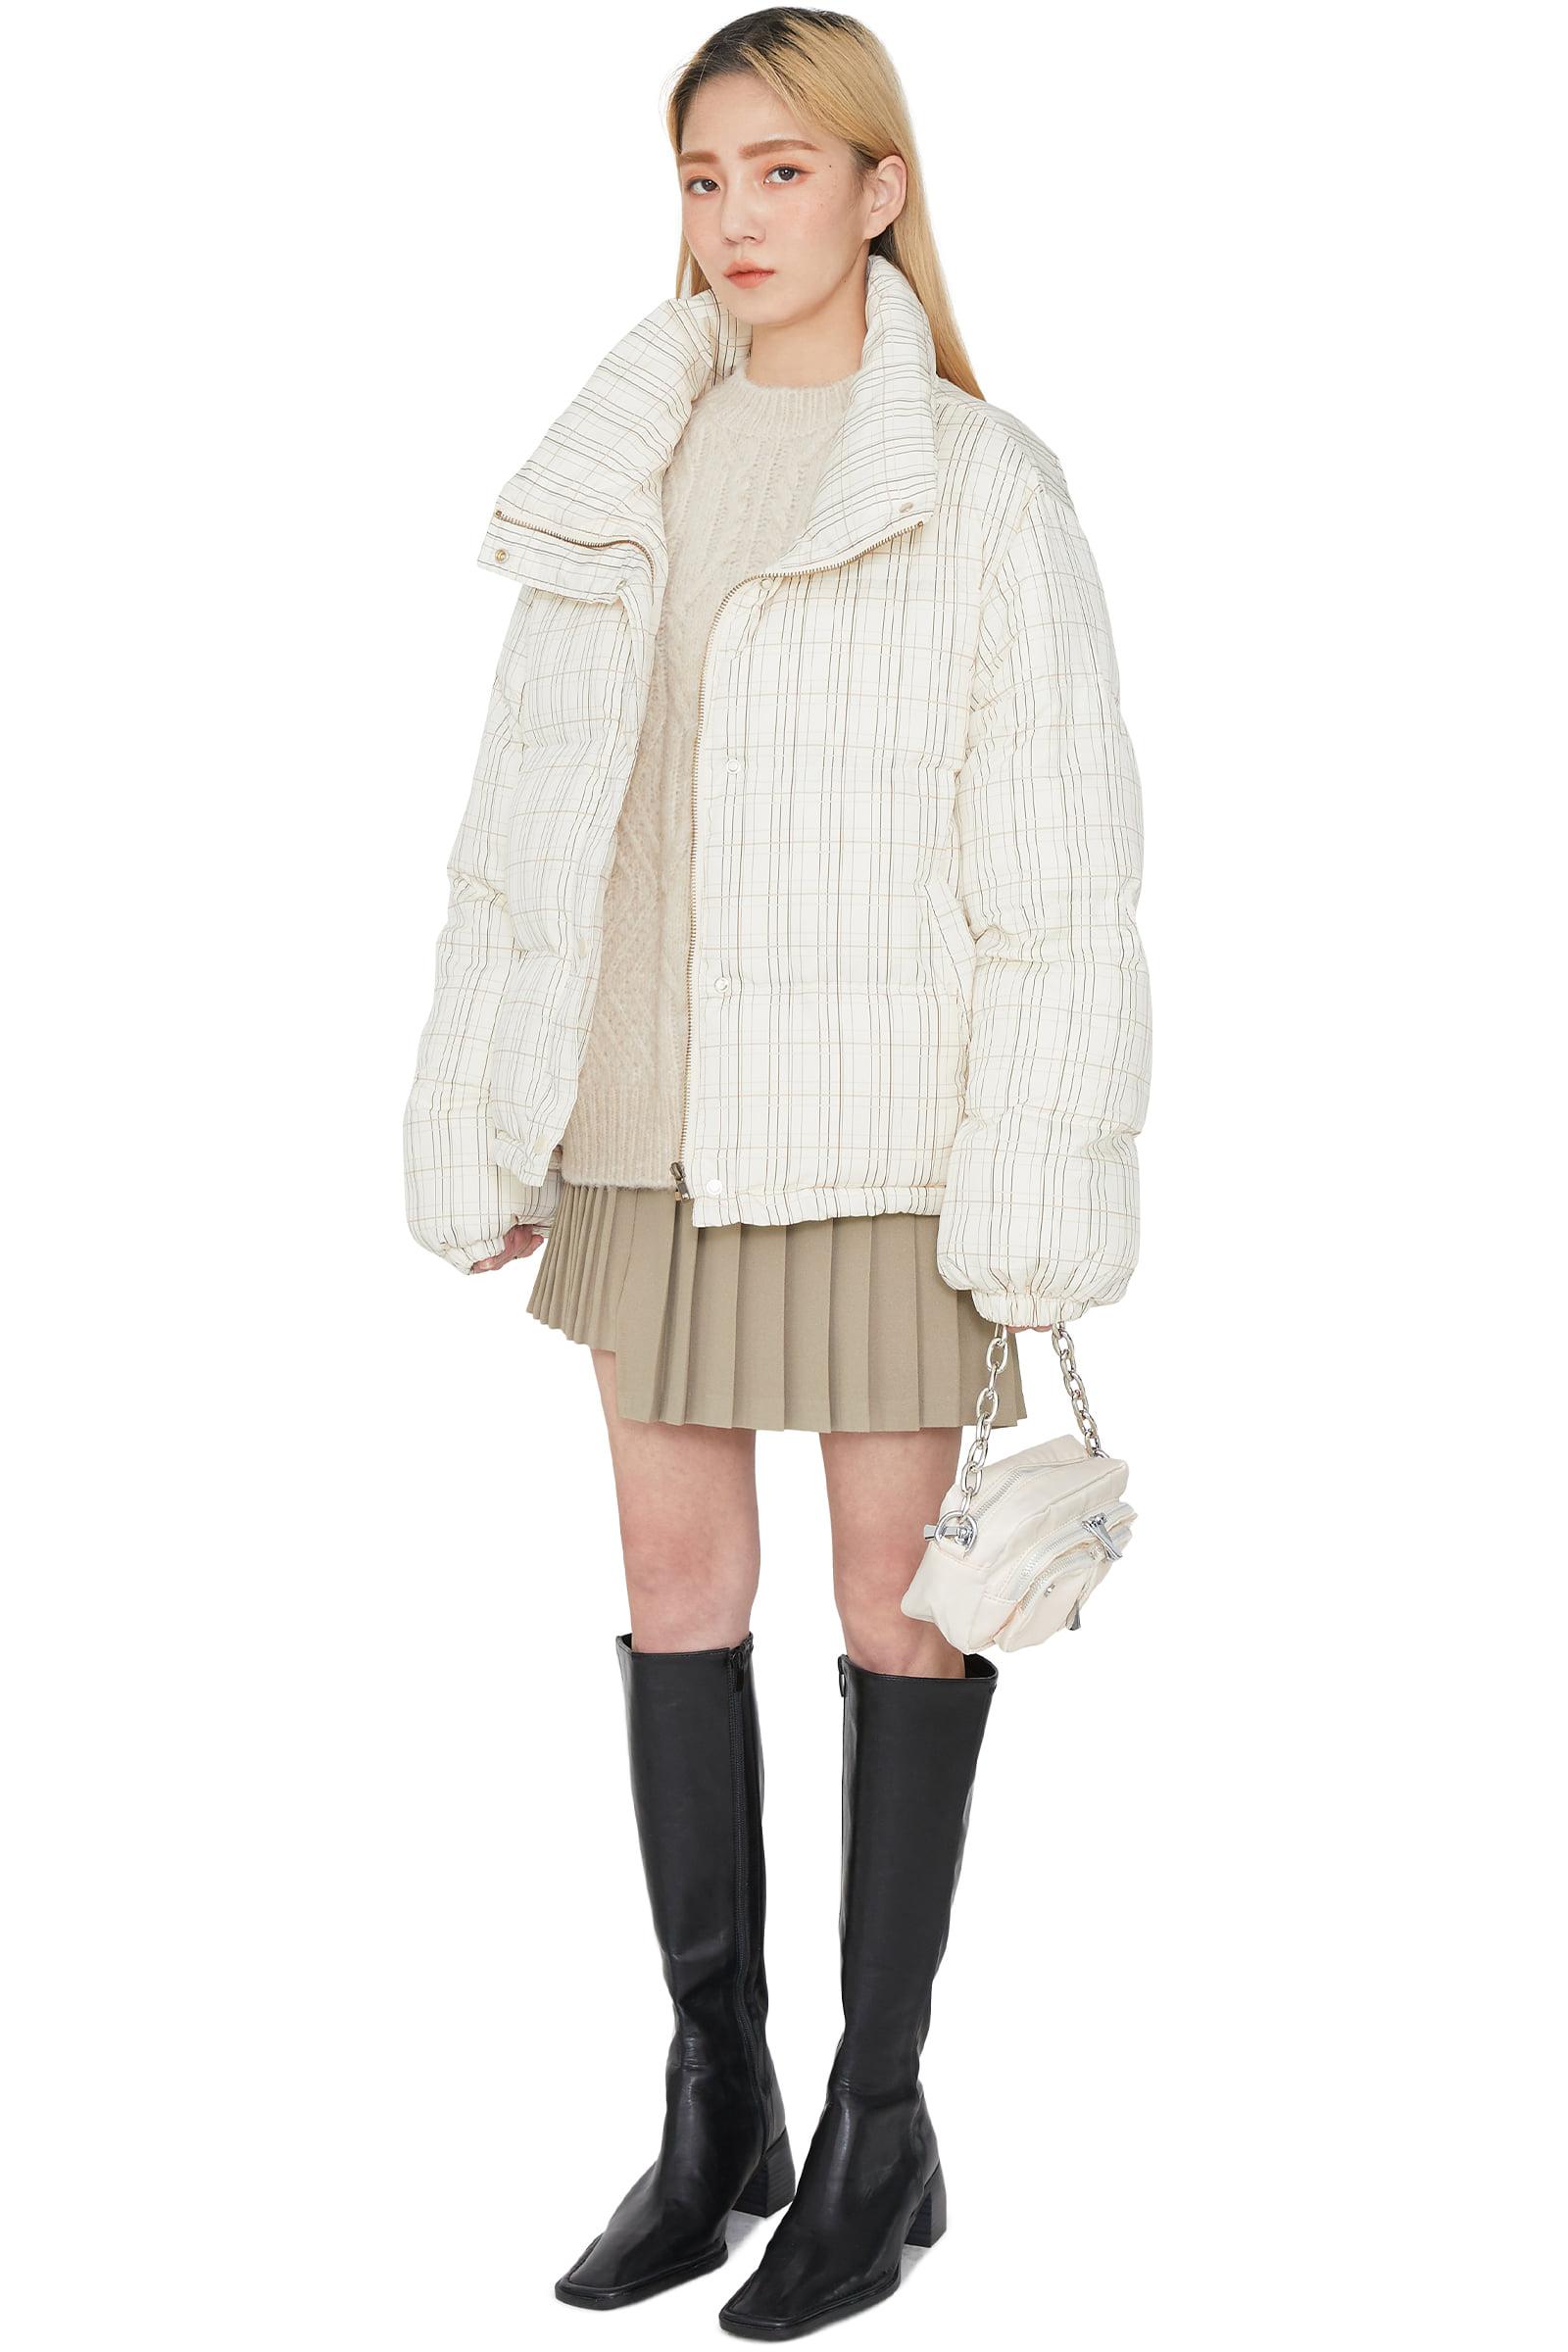 Rose Unfoot Tennis Mini Skirt